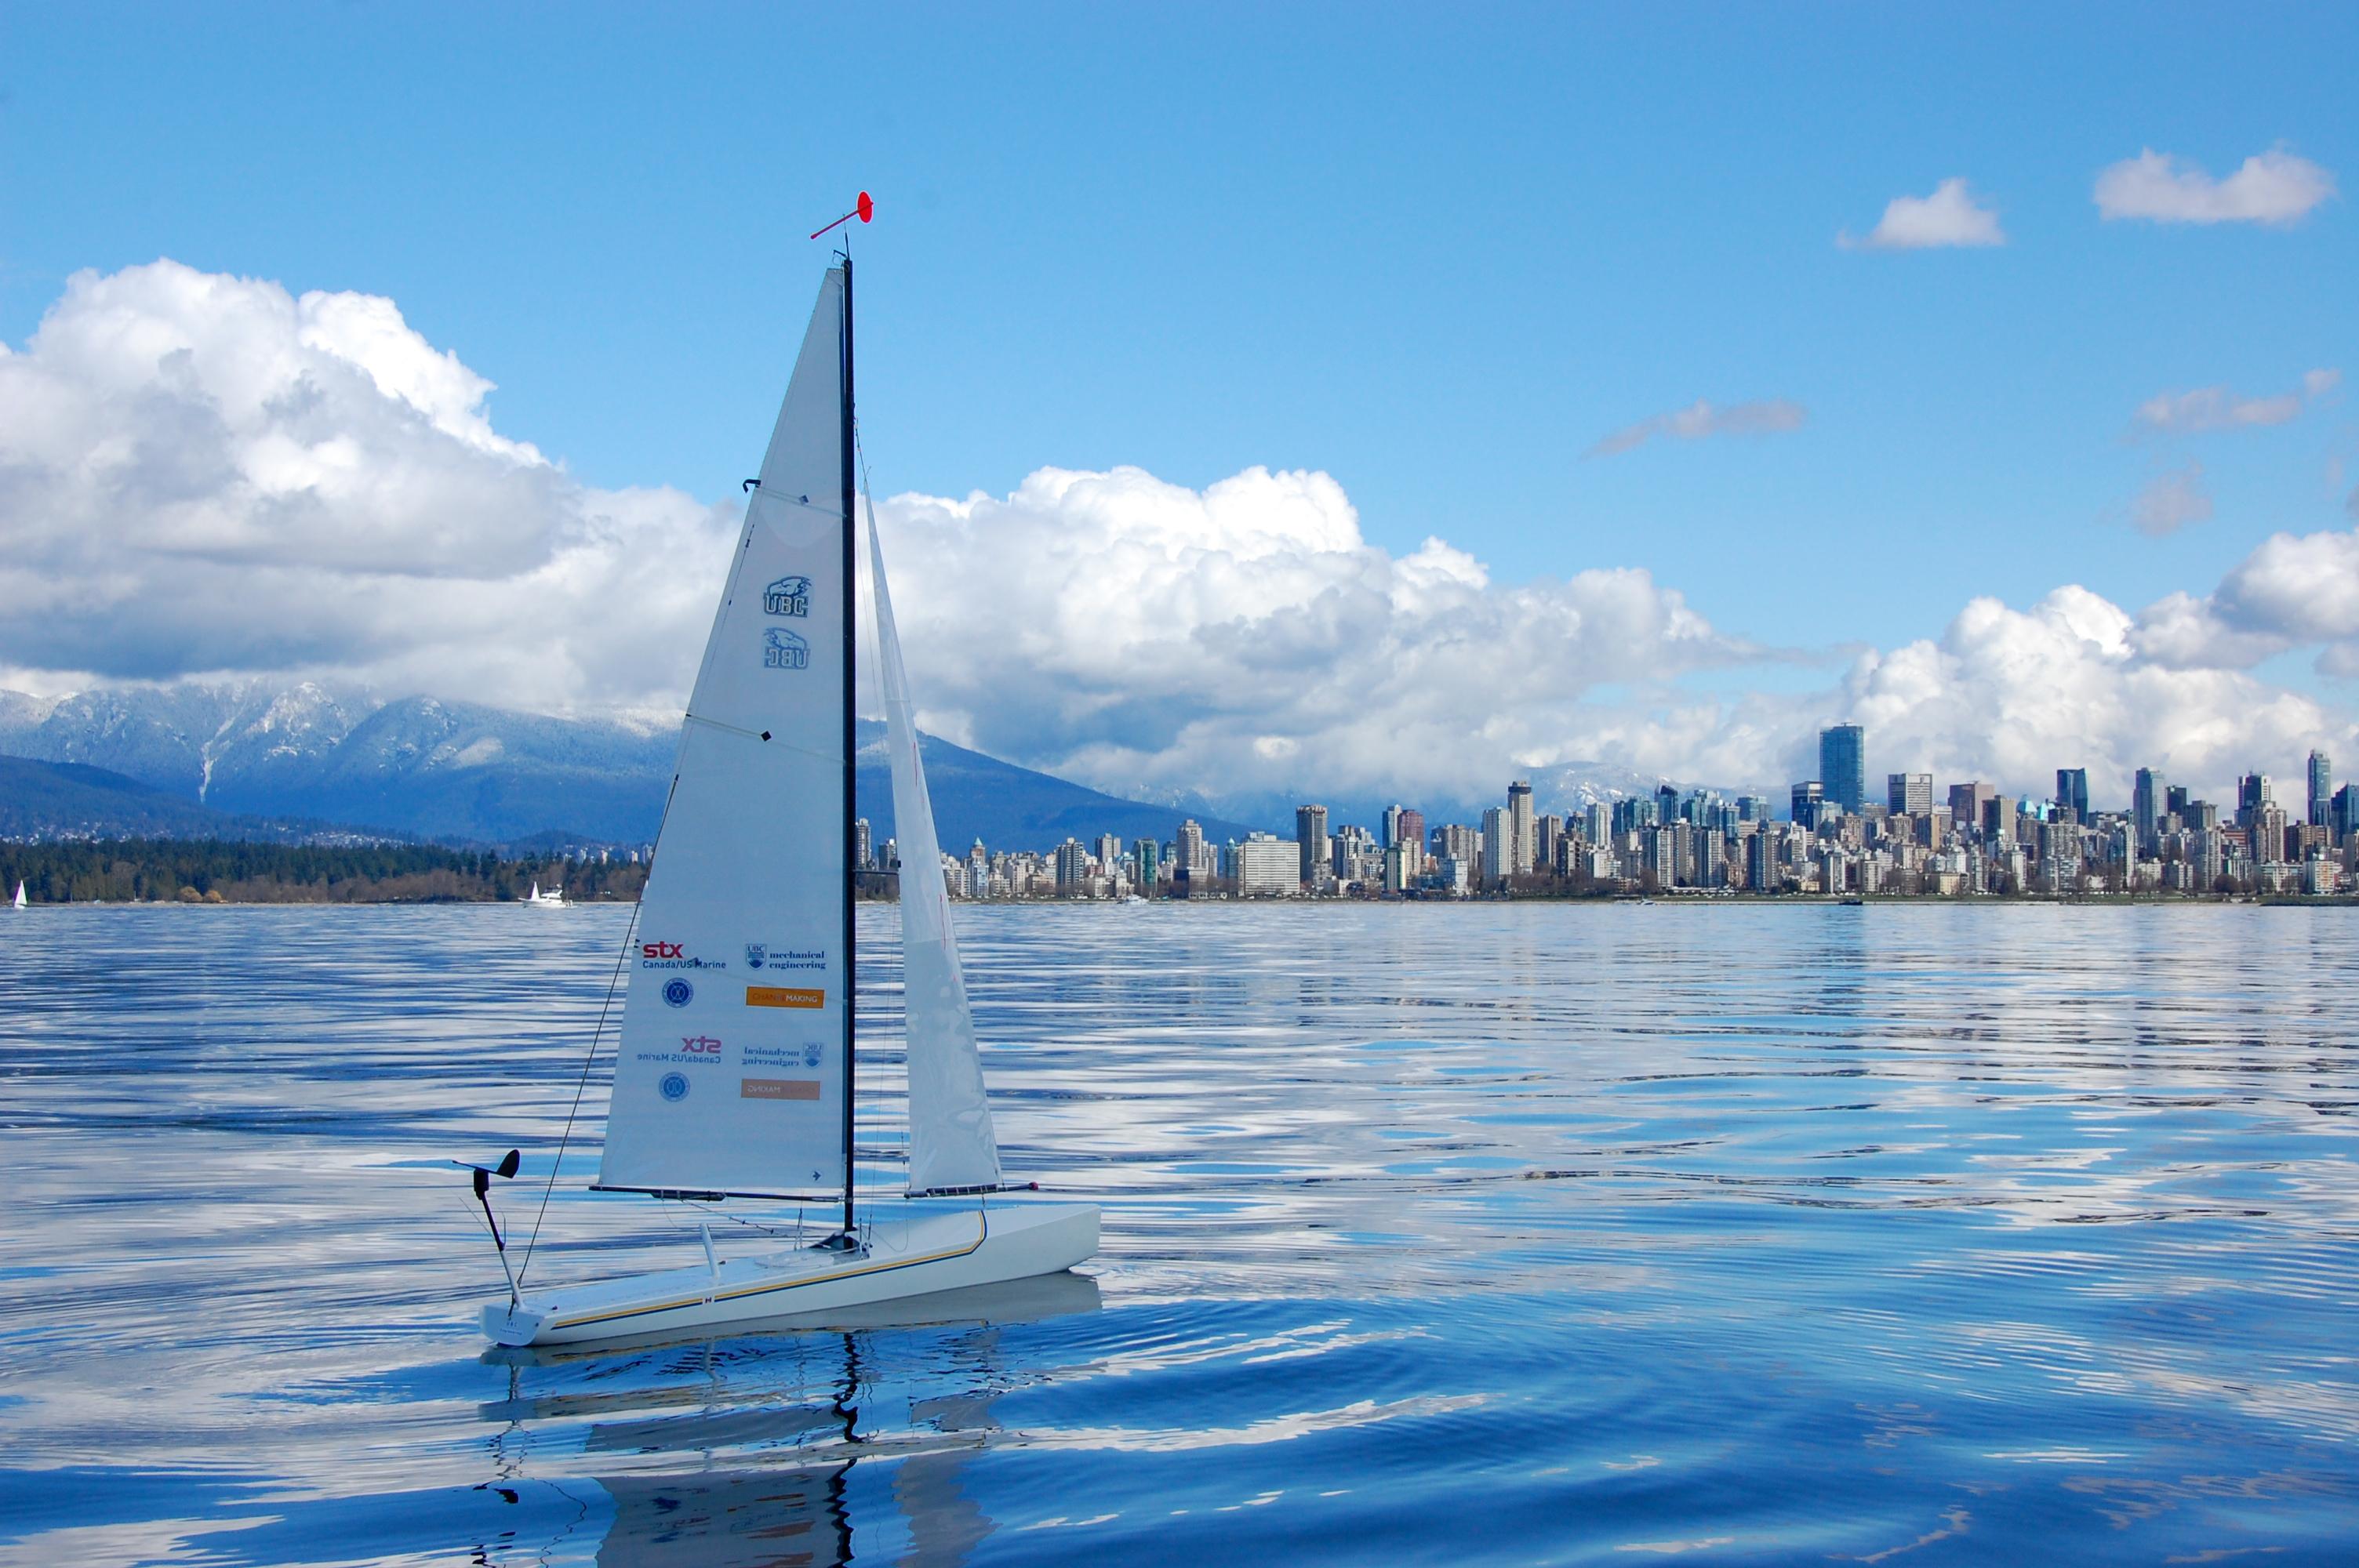 Photo courtesy of the UBC SailBot Team